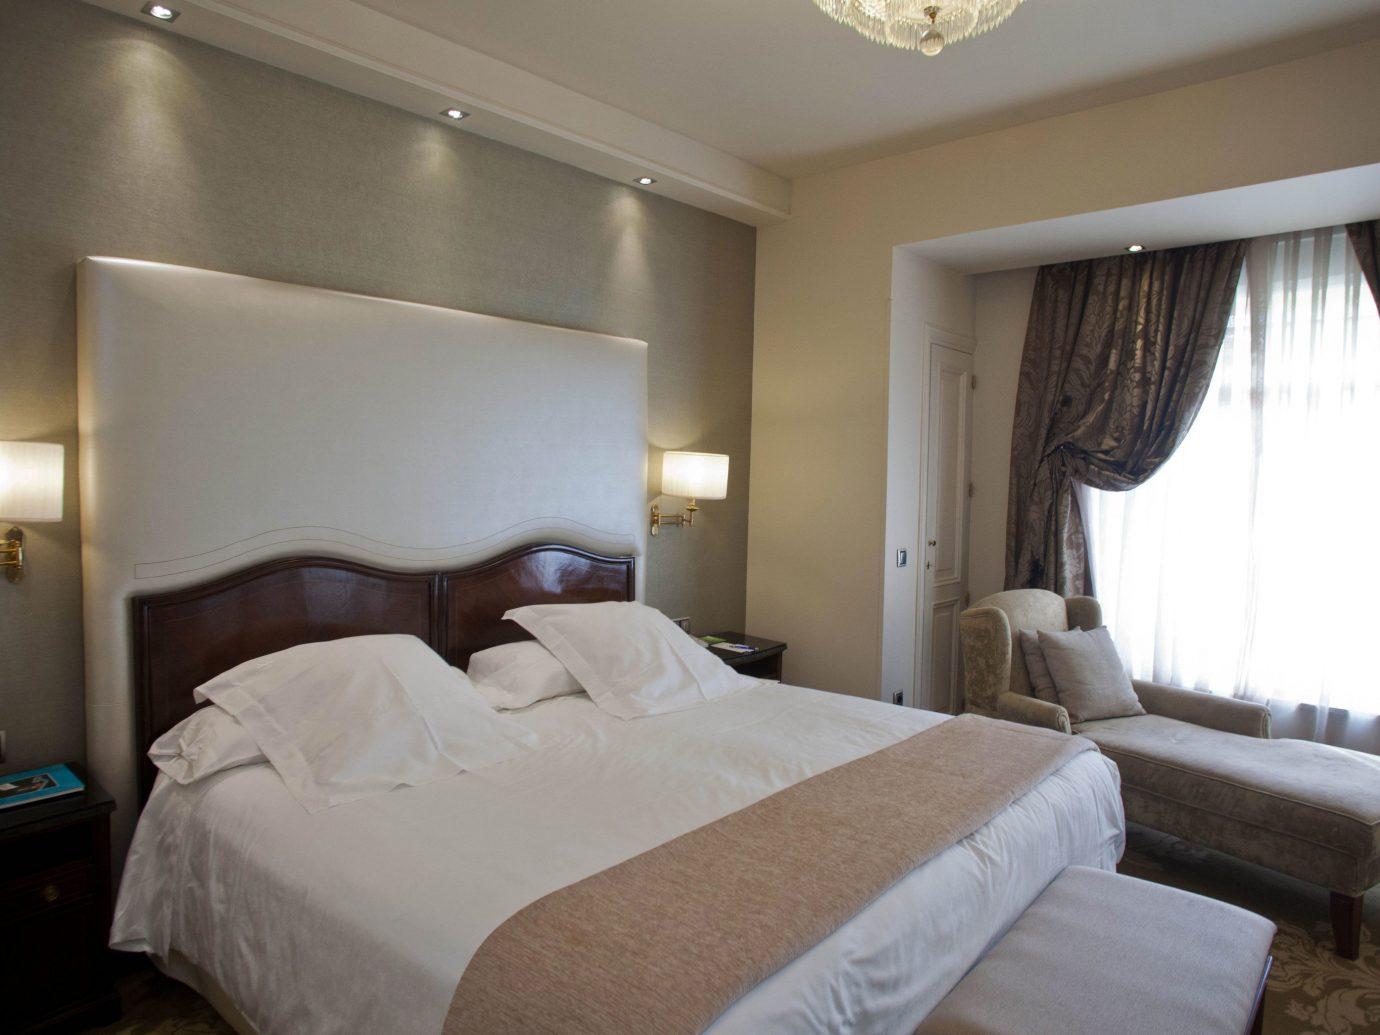 Hotels Madrid Spain bed indoor wall hotel Bedroom room ceiling property Suite interior design real estate cottage estate apartment condominium